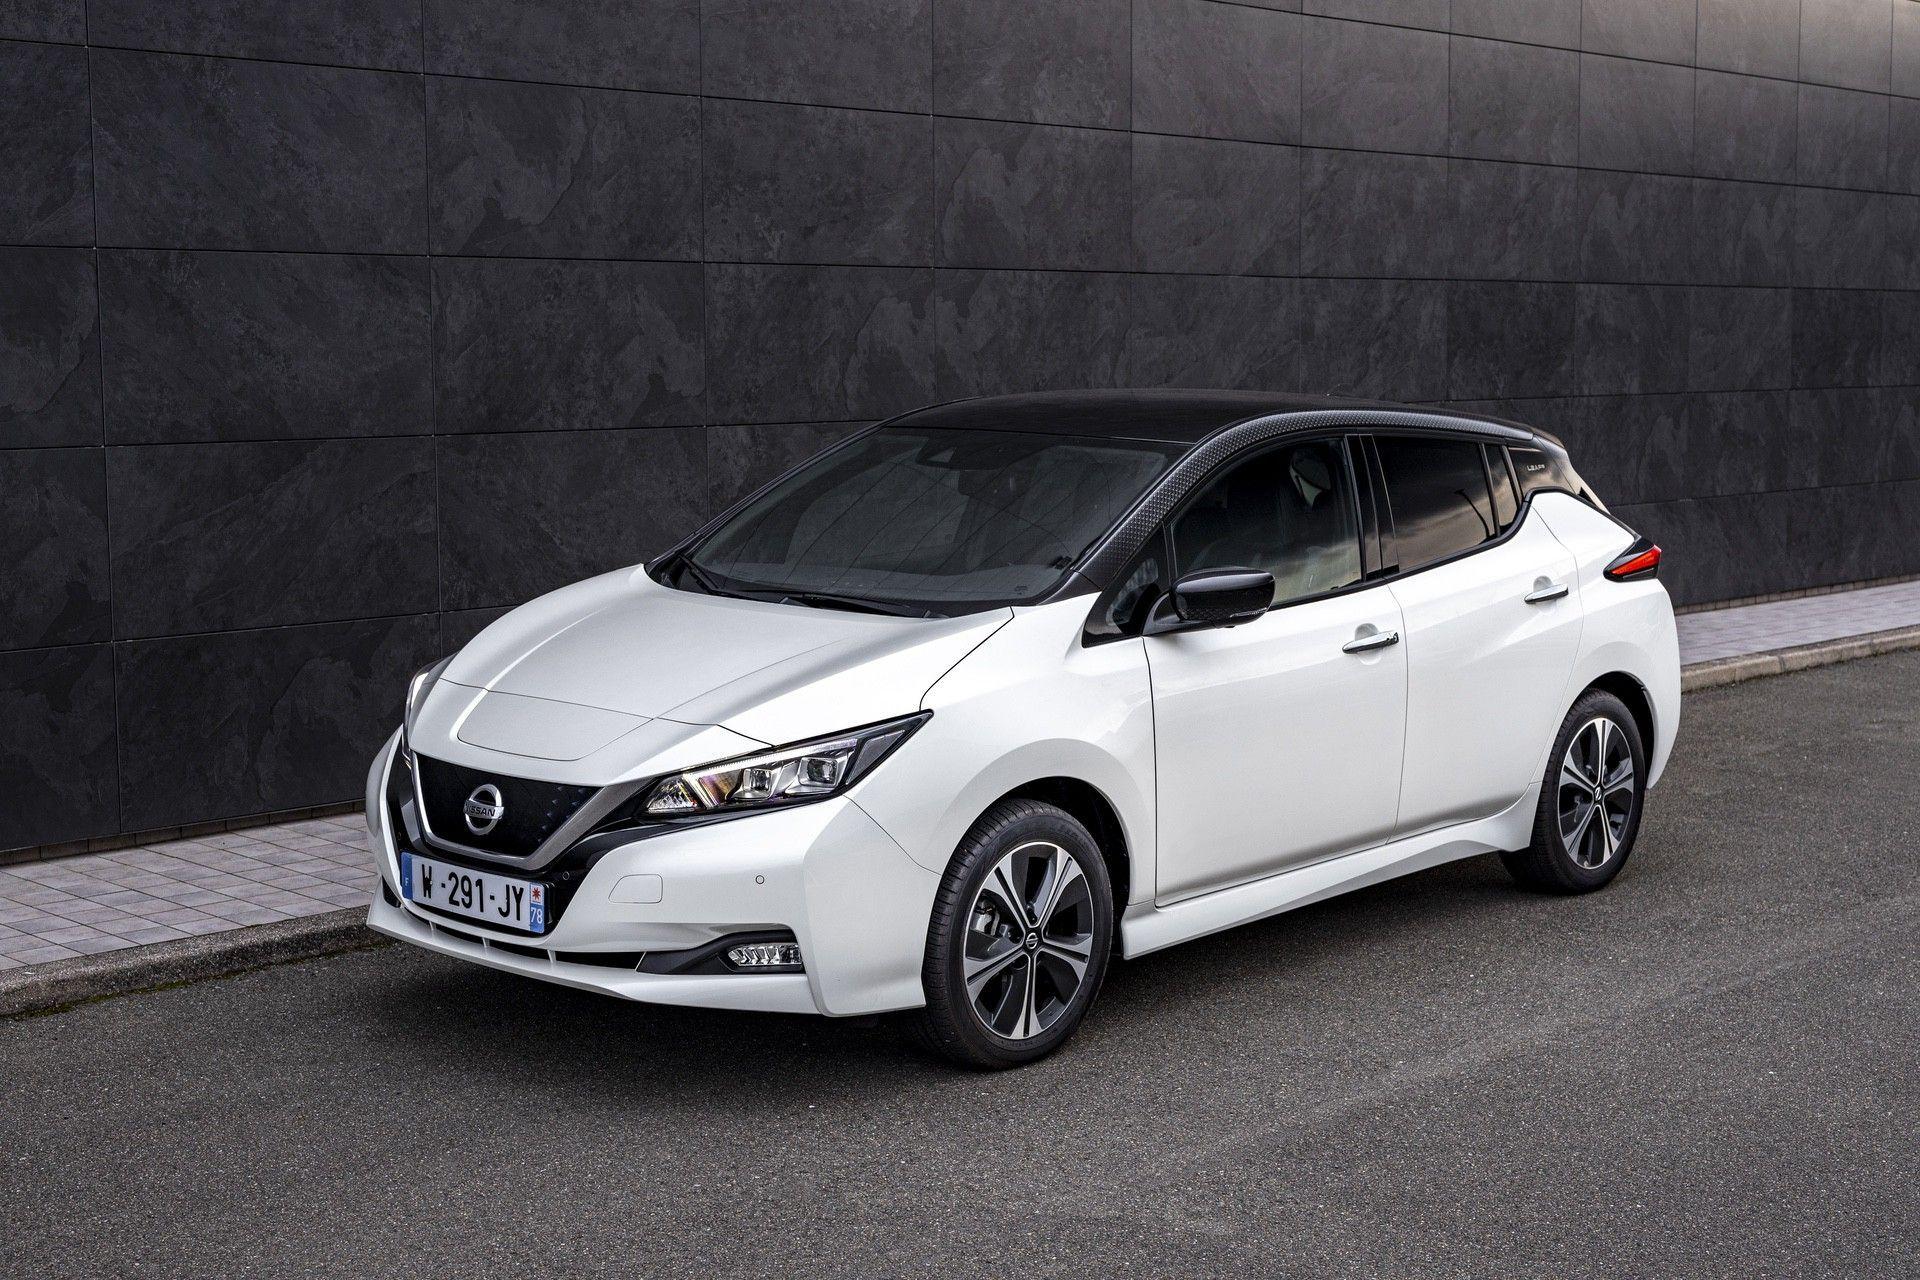 Nissan_Leaf10_special_edition-0000